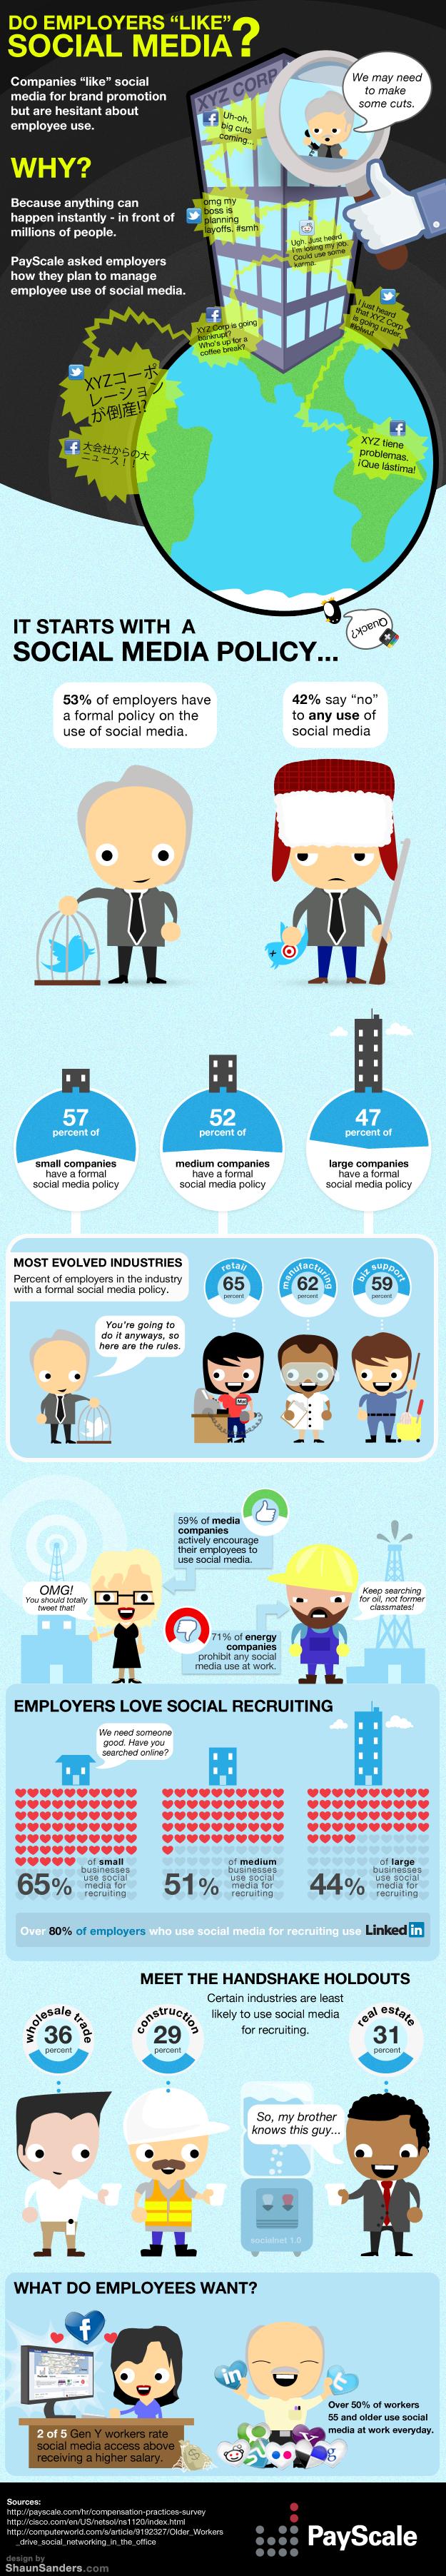 Do Employers 'Like' Social Media?